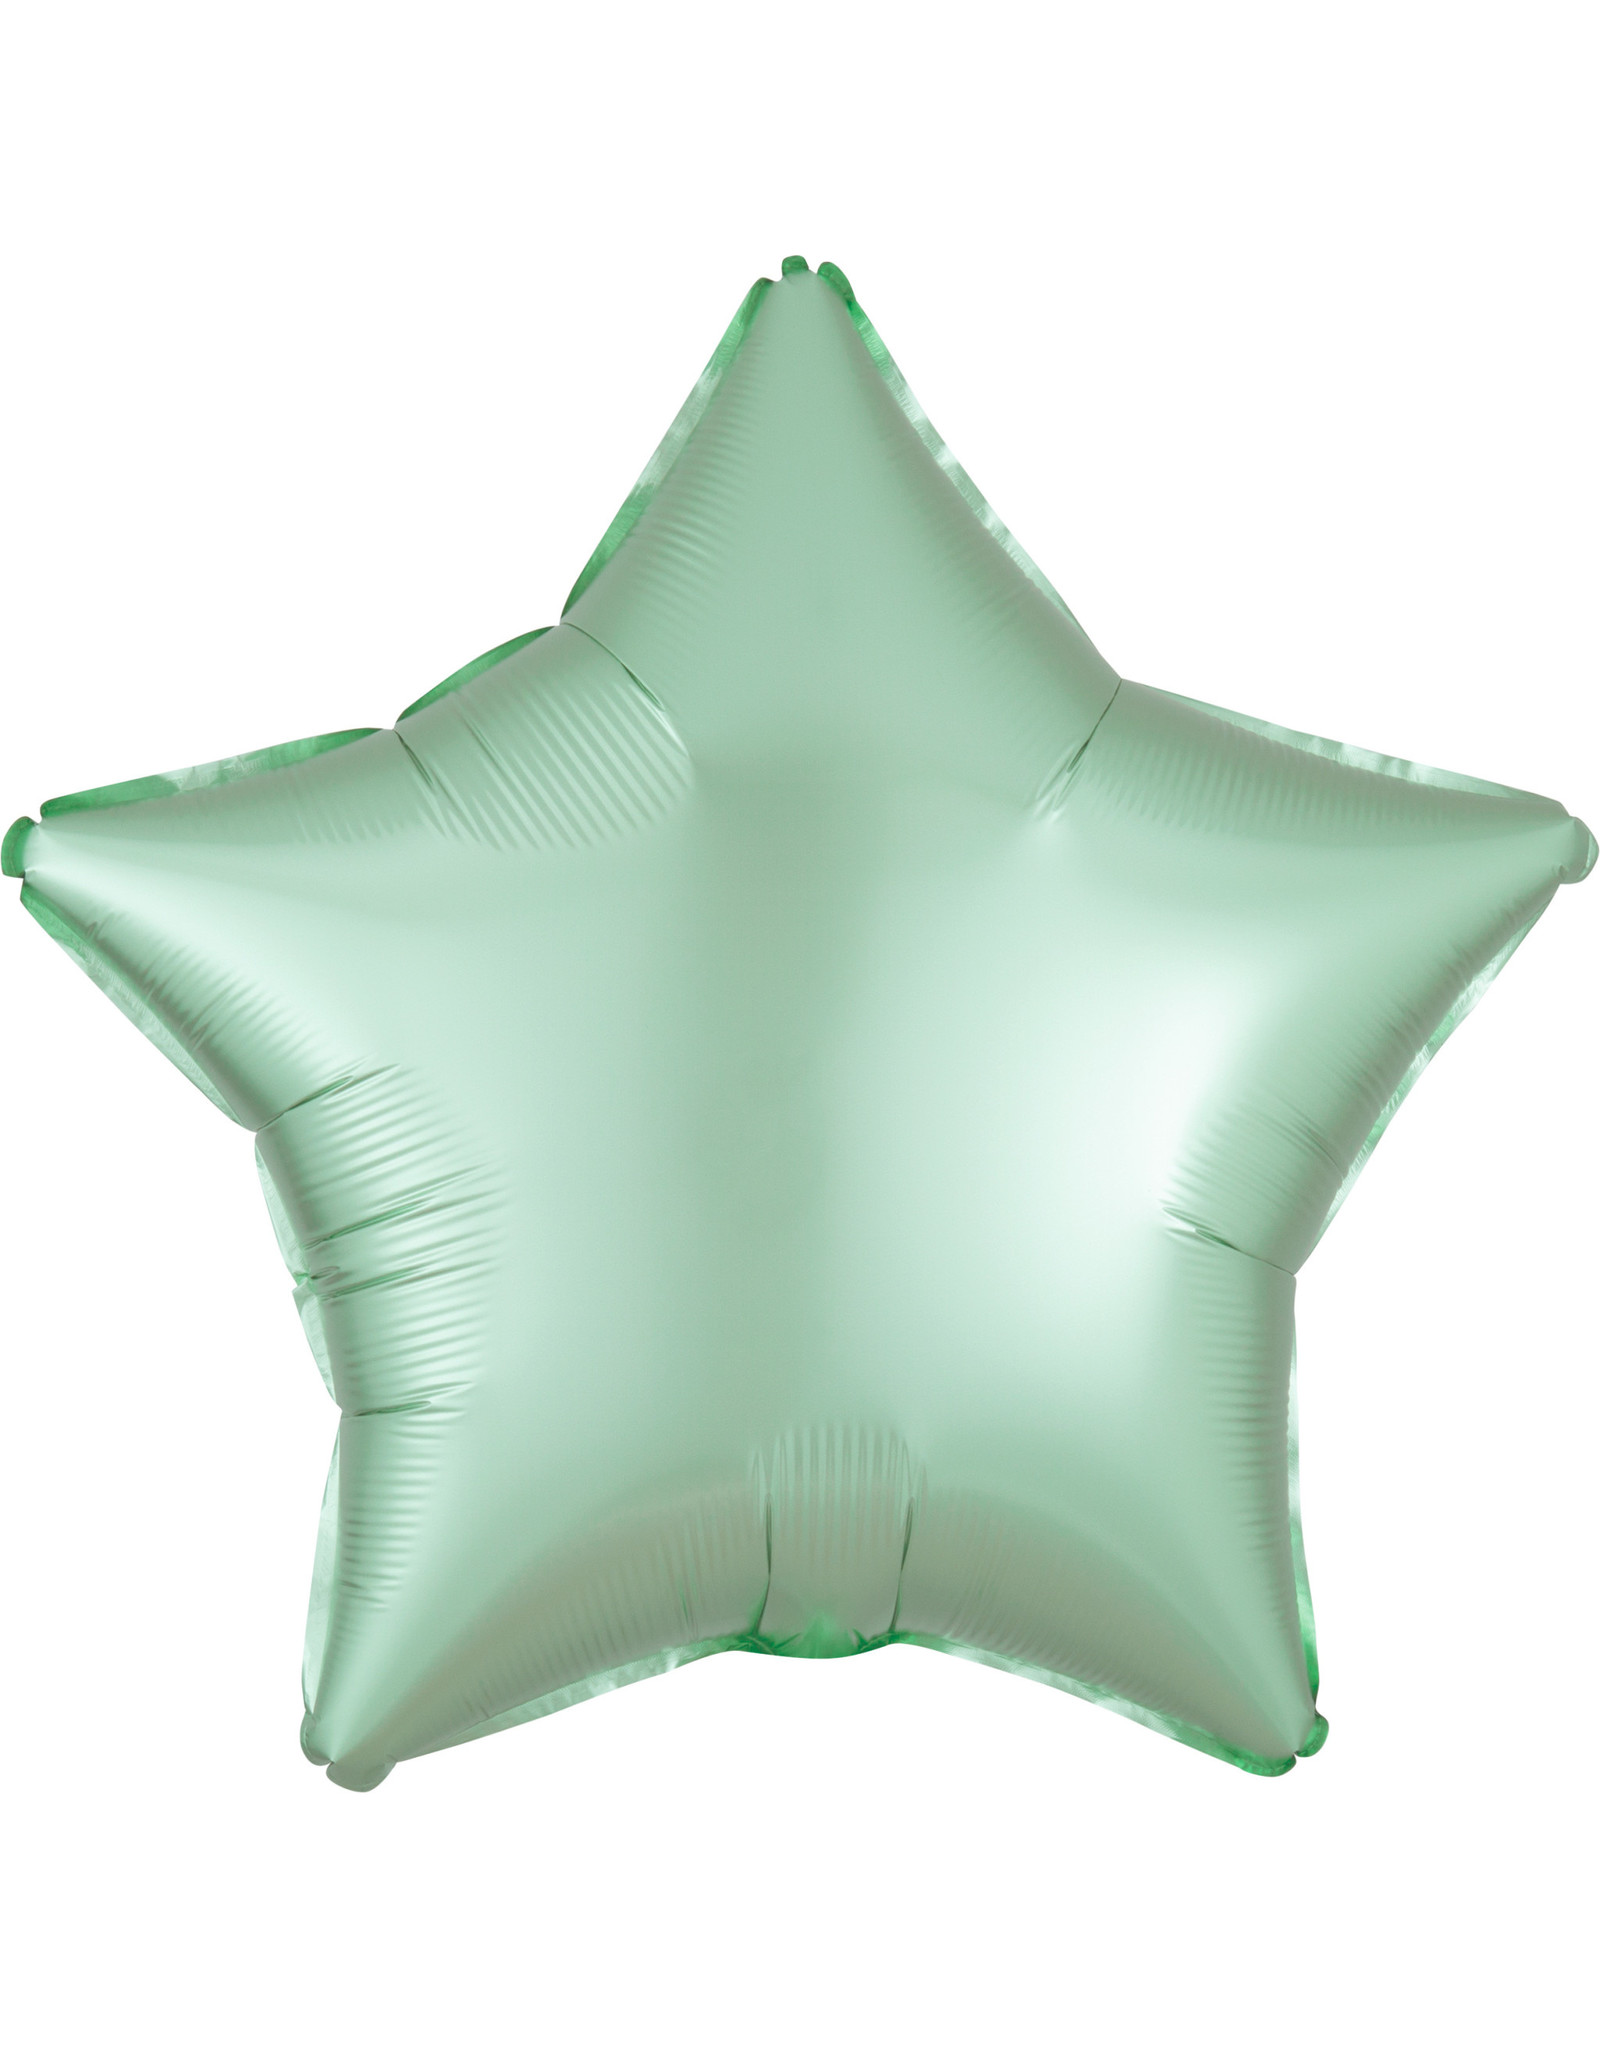 Amscan folieballon mint groen ster 48 cm